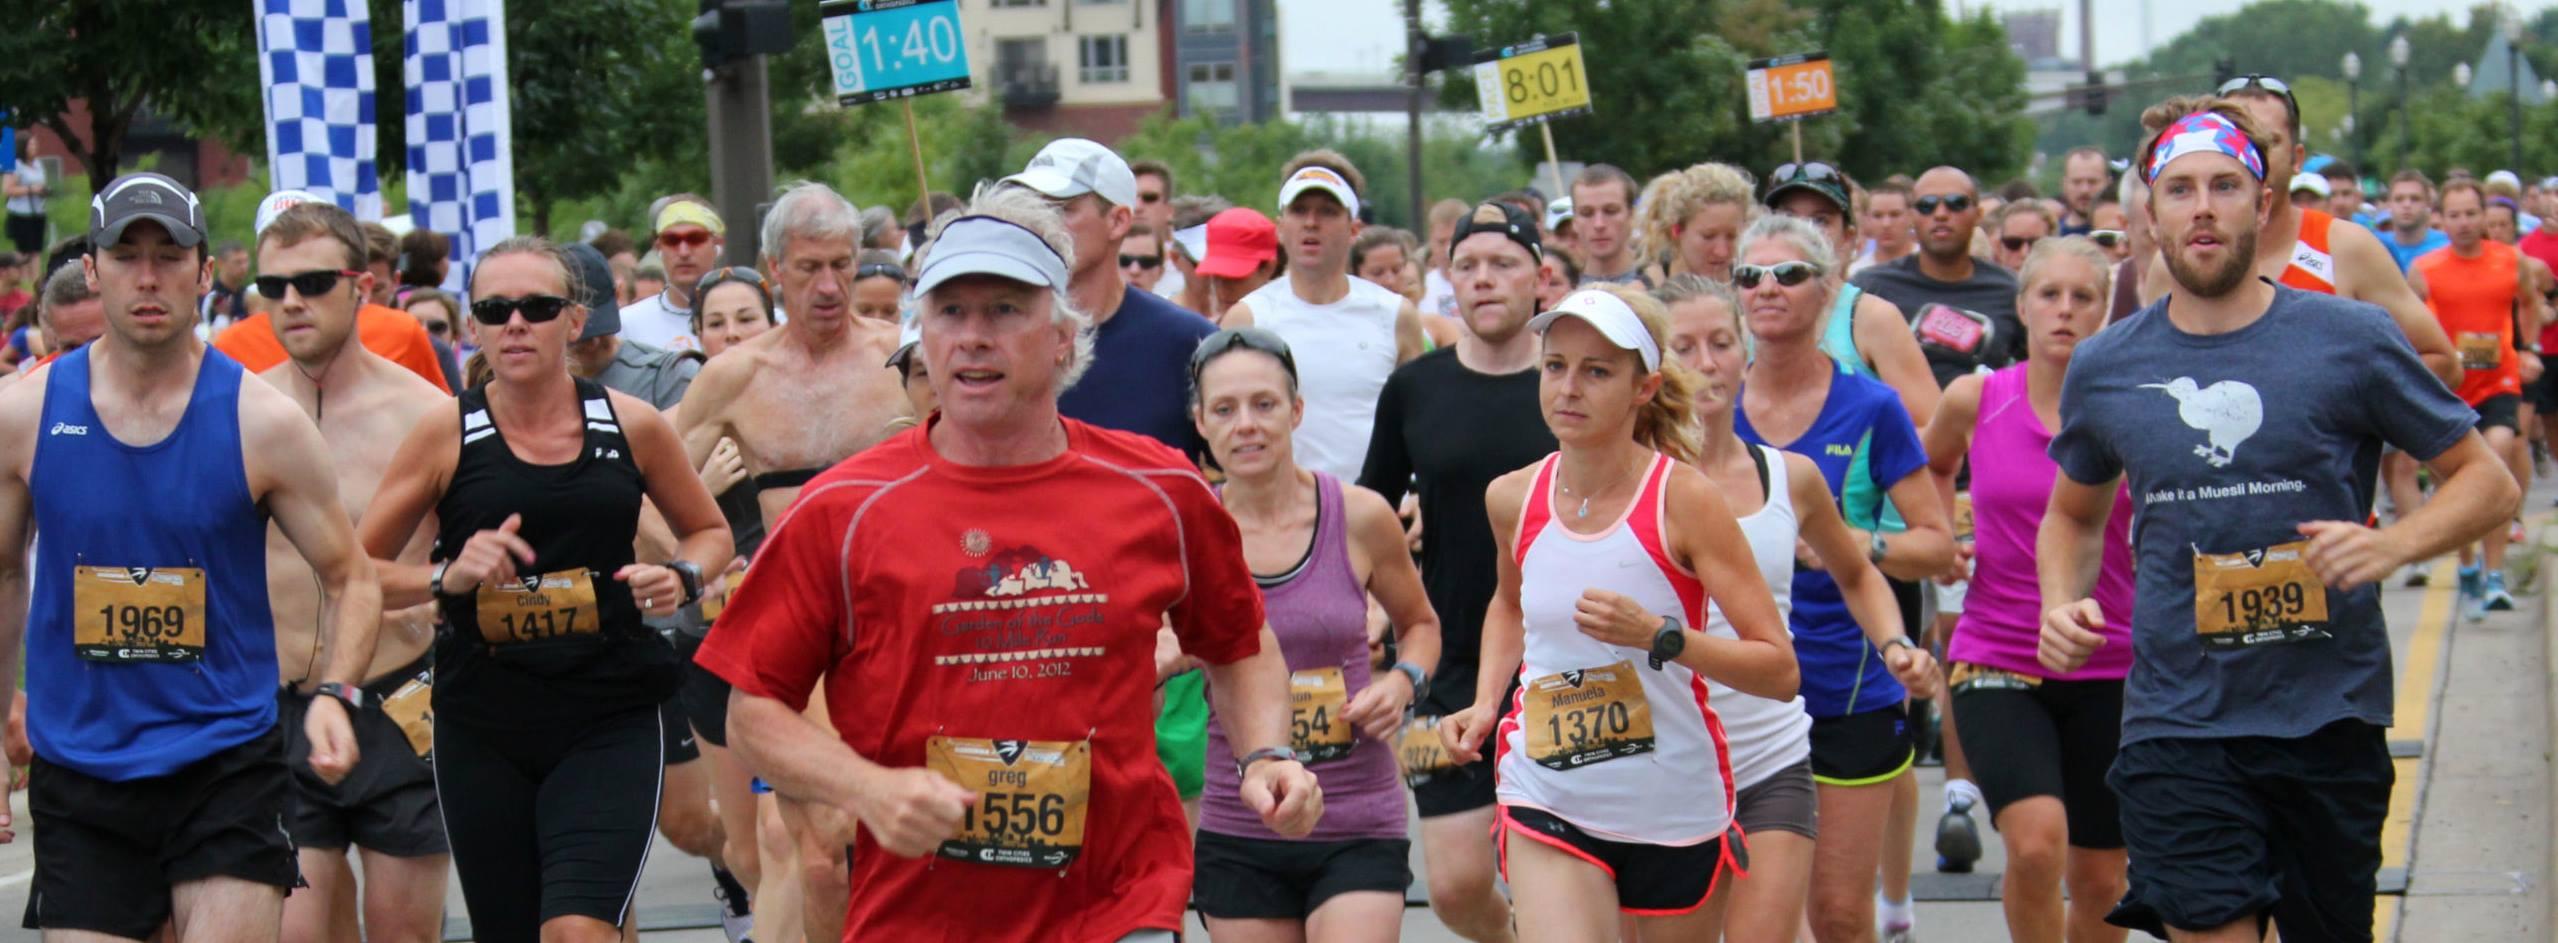 minnesota half marathon